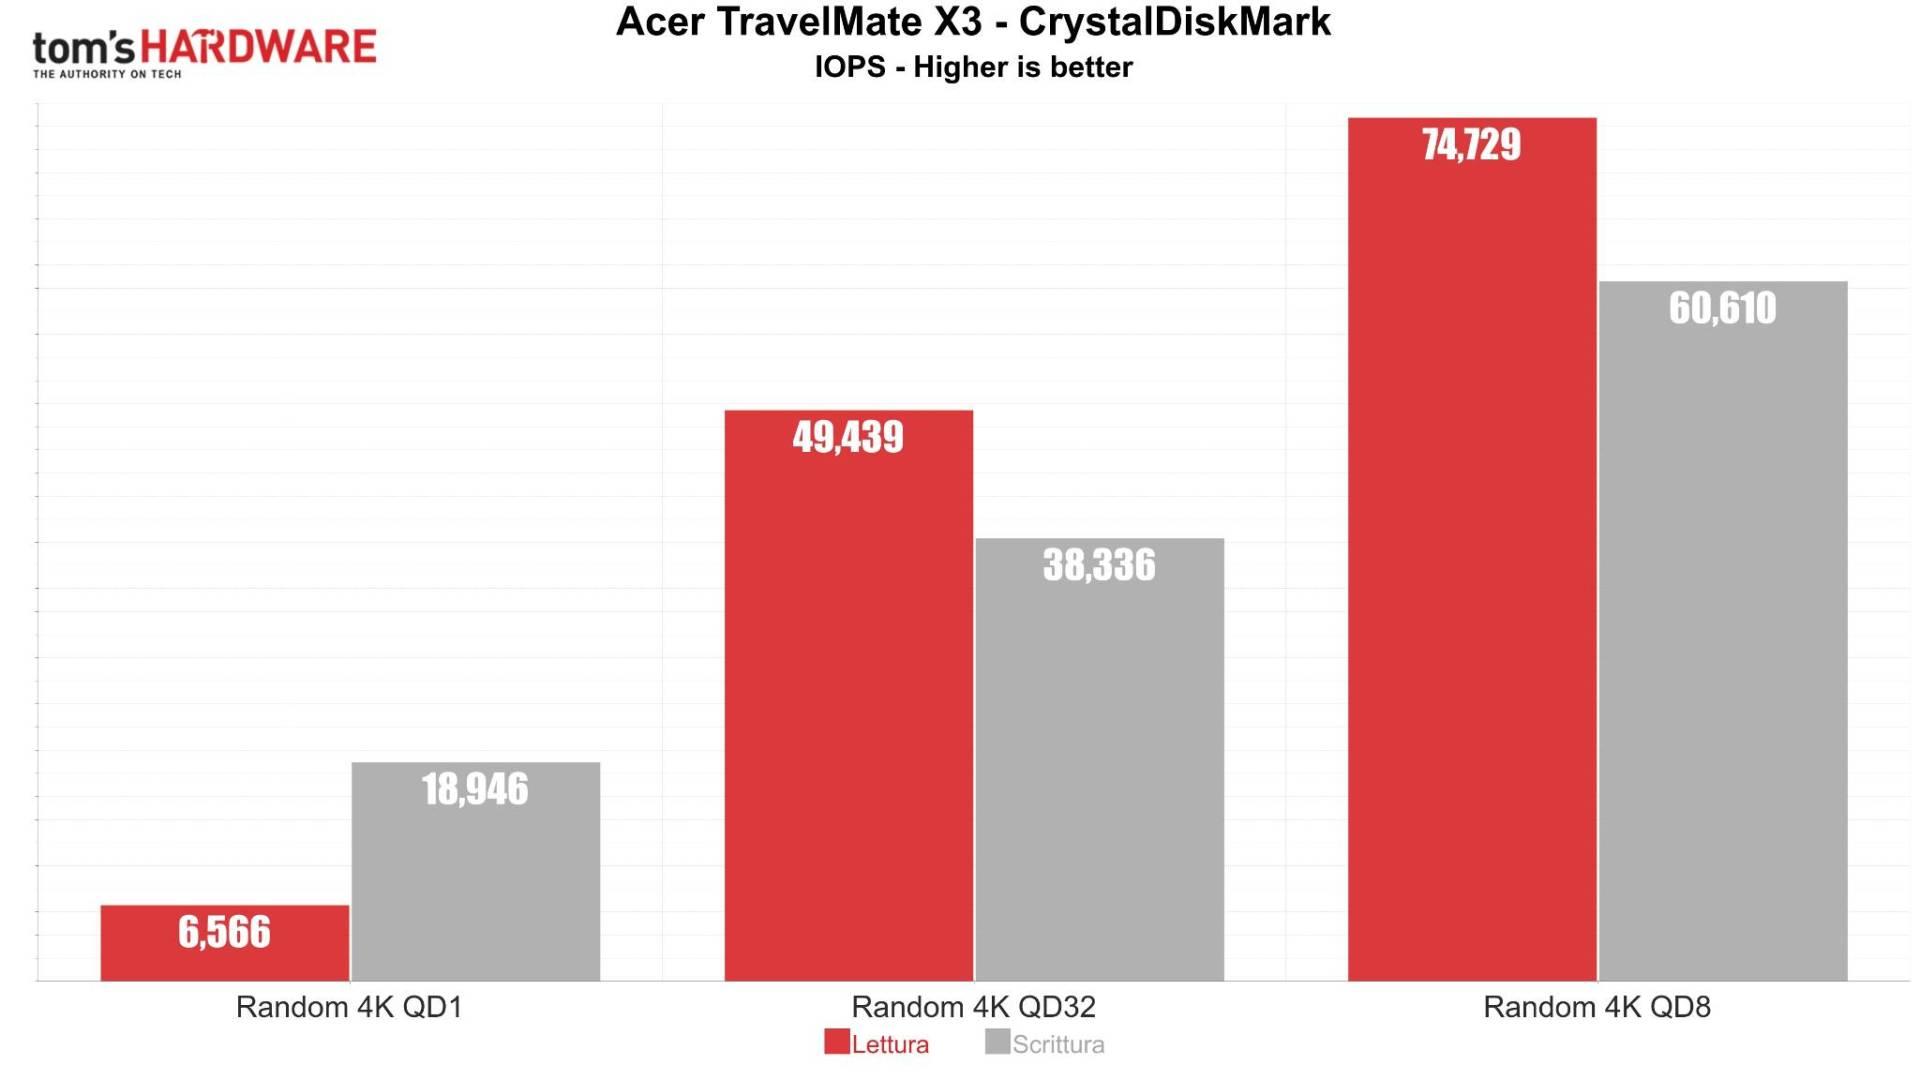 Acer TravelMate X3 CrystalDiskMark